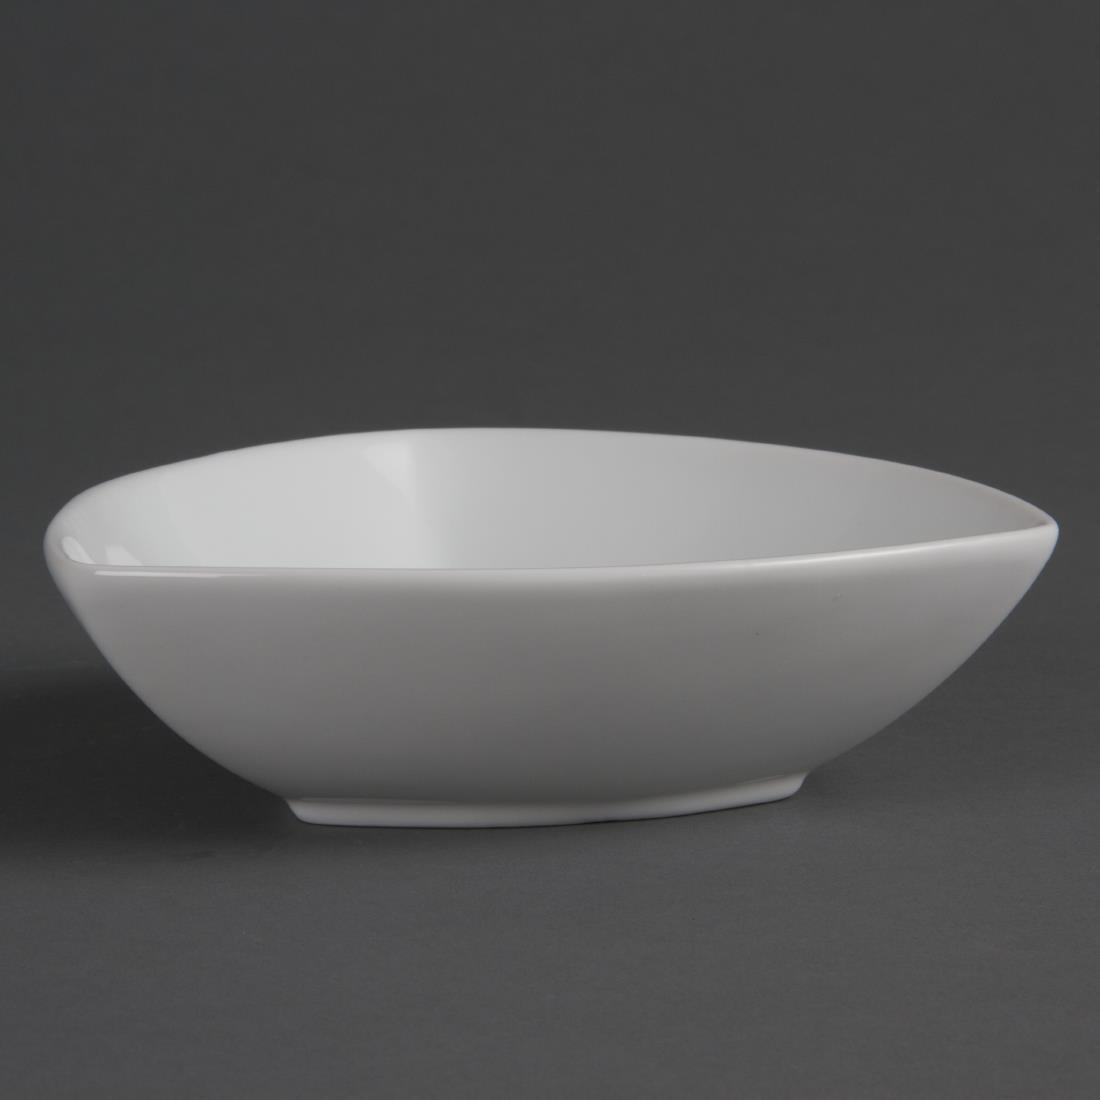 Rounded Triangular Bowl